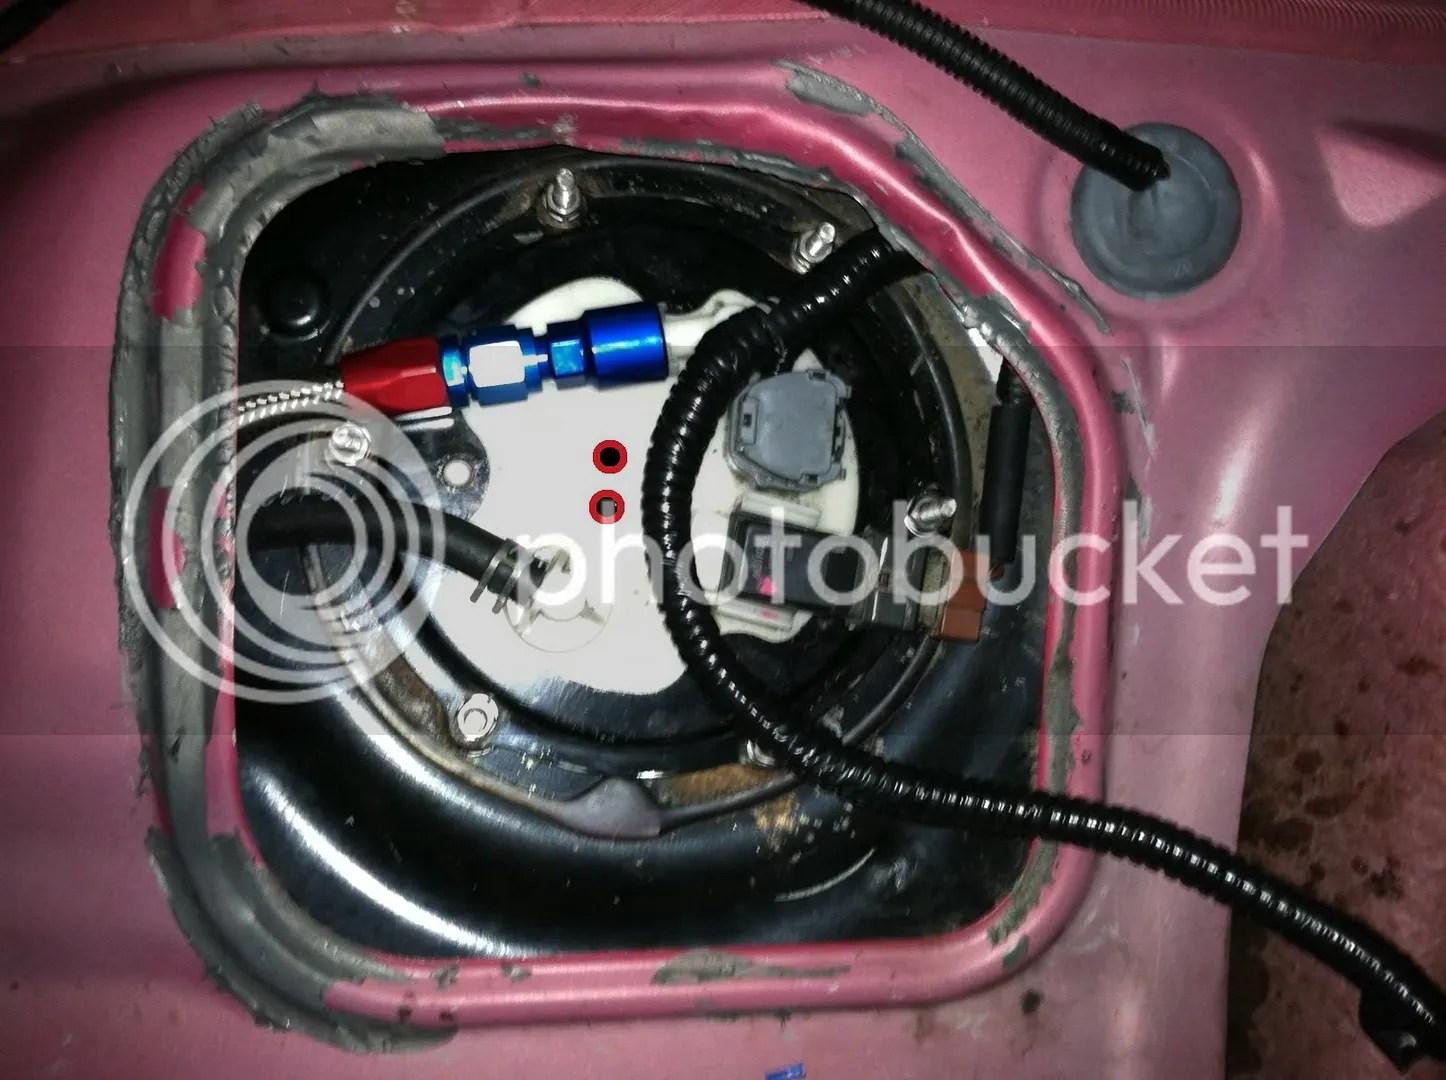 hight resolution of airtexr wh8001 fuel pump wiring harness wiring diagram blog airtexr isuzu rodeo 2001 fuel pump wiring harness